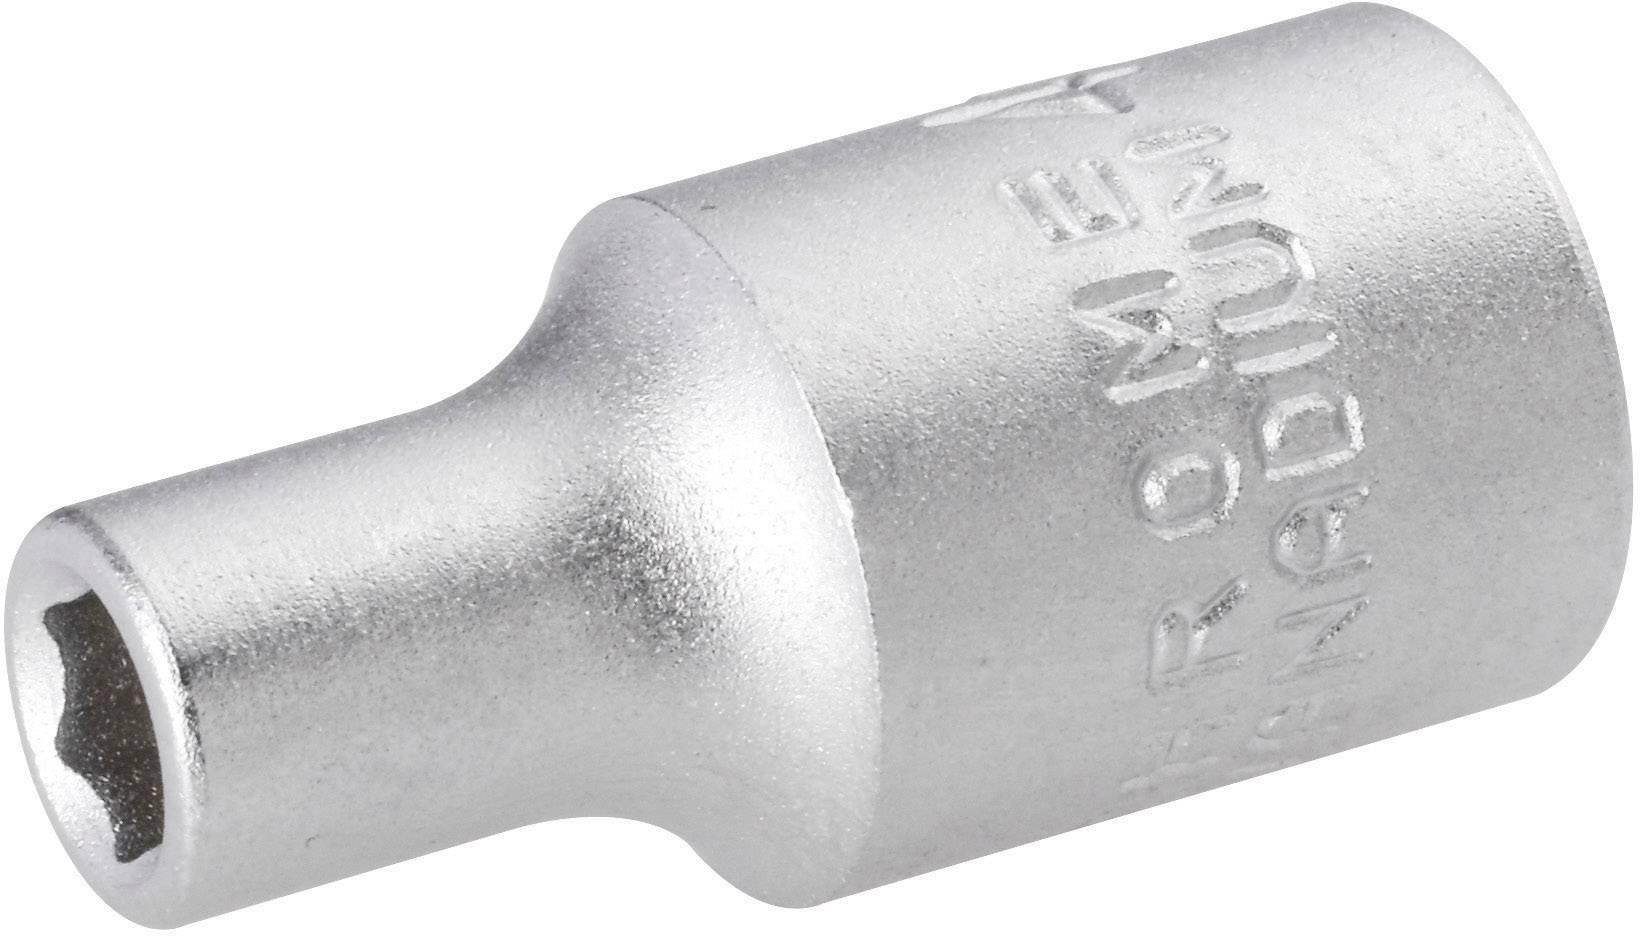 "Nástavec na račňu TOOLCRAFT 820743, vonkajší šesťhran, 1/4"" (6,3 mm), 5 mm, chróm-vanadiová oceľ"